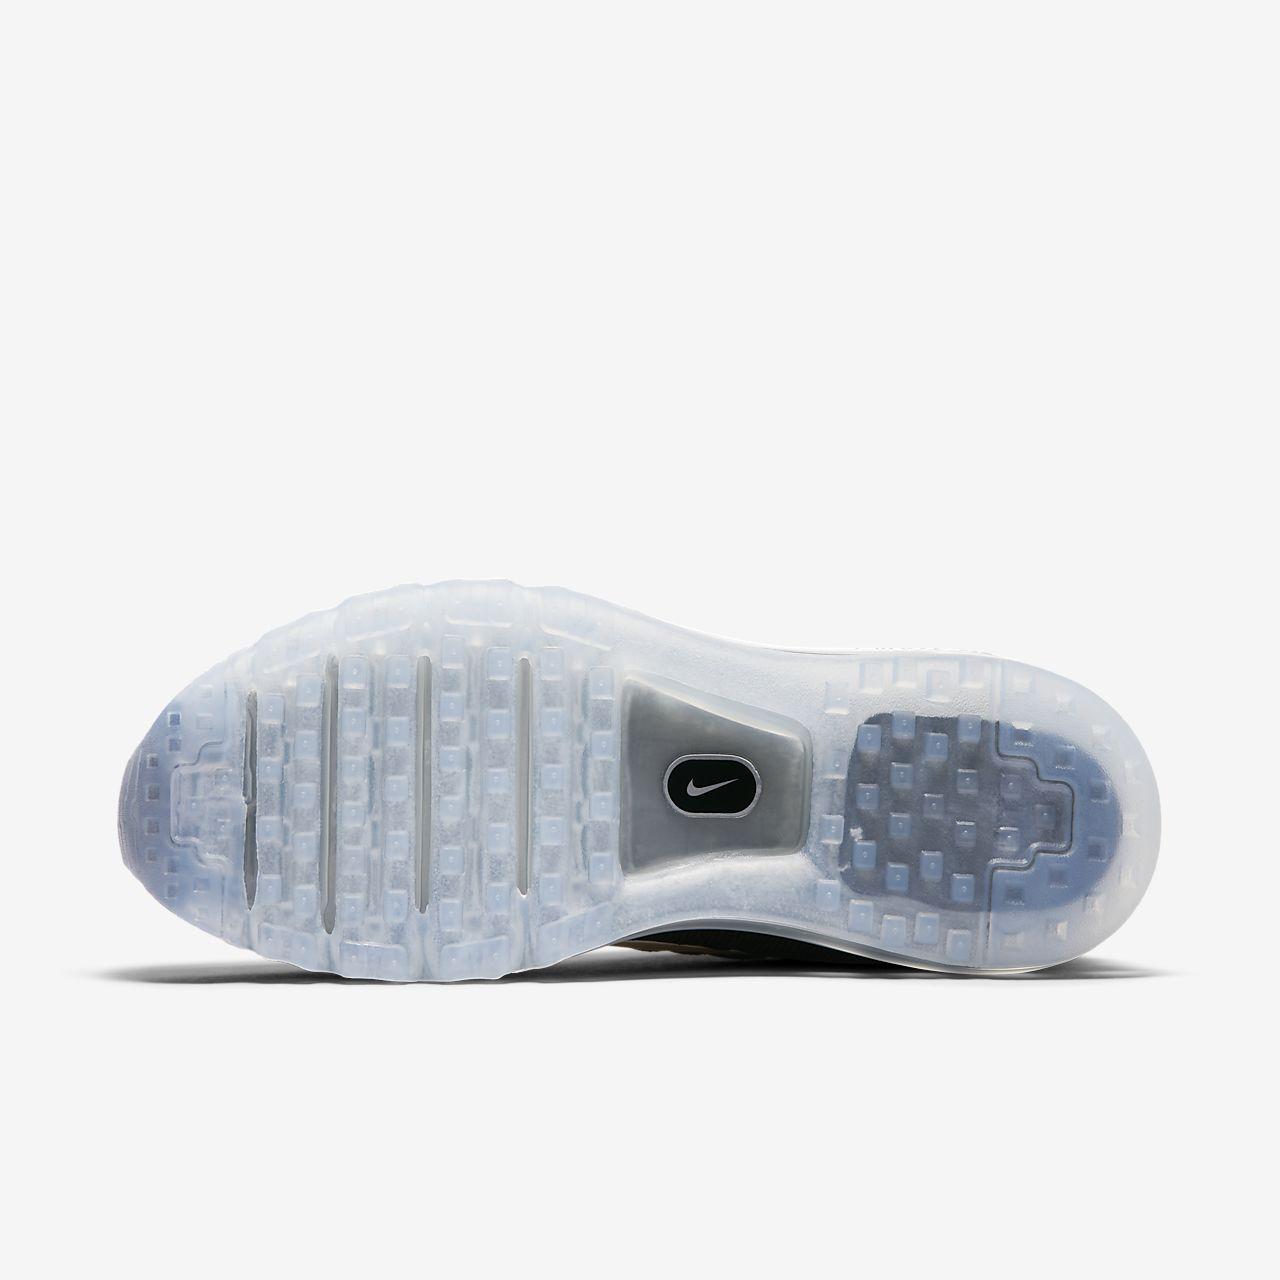 Max Nike Design Pas Femme Air 95 Cher Futuriste Bleu THxqfrwnT